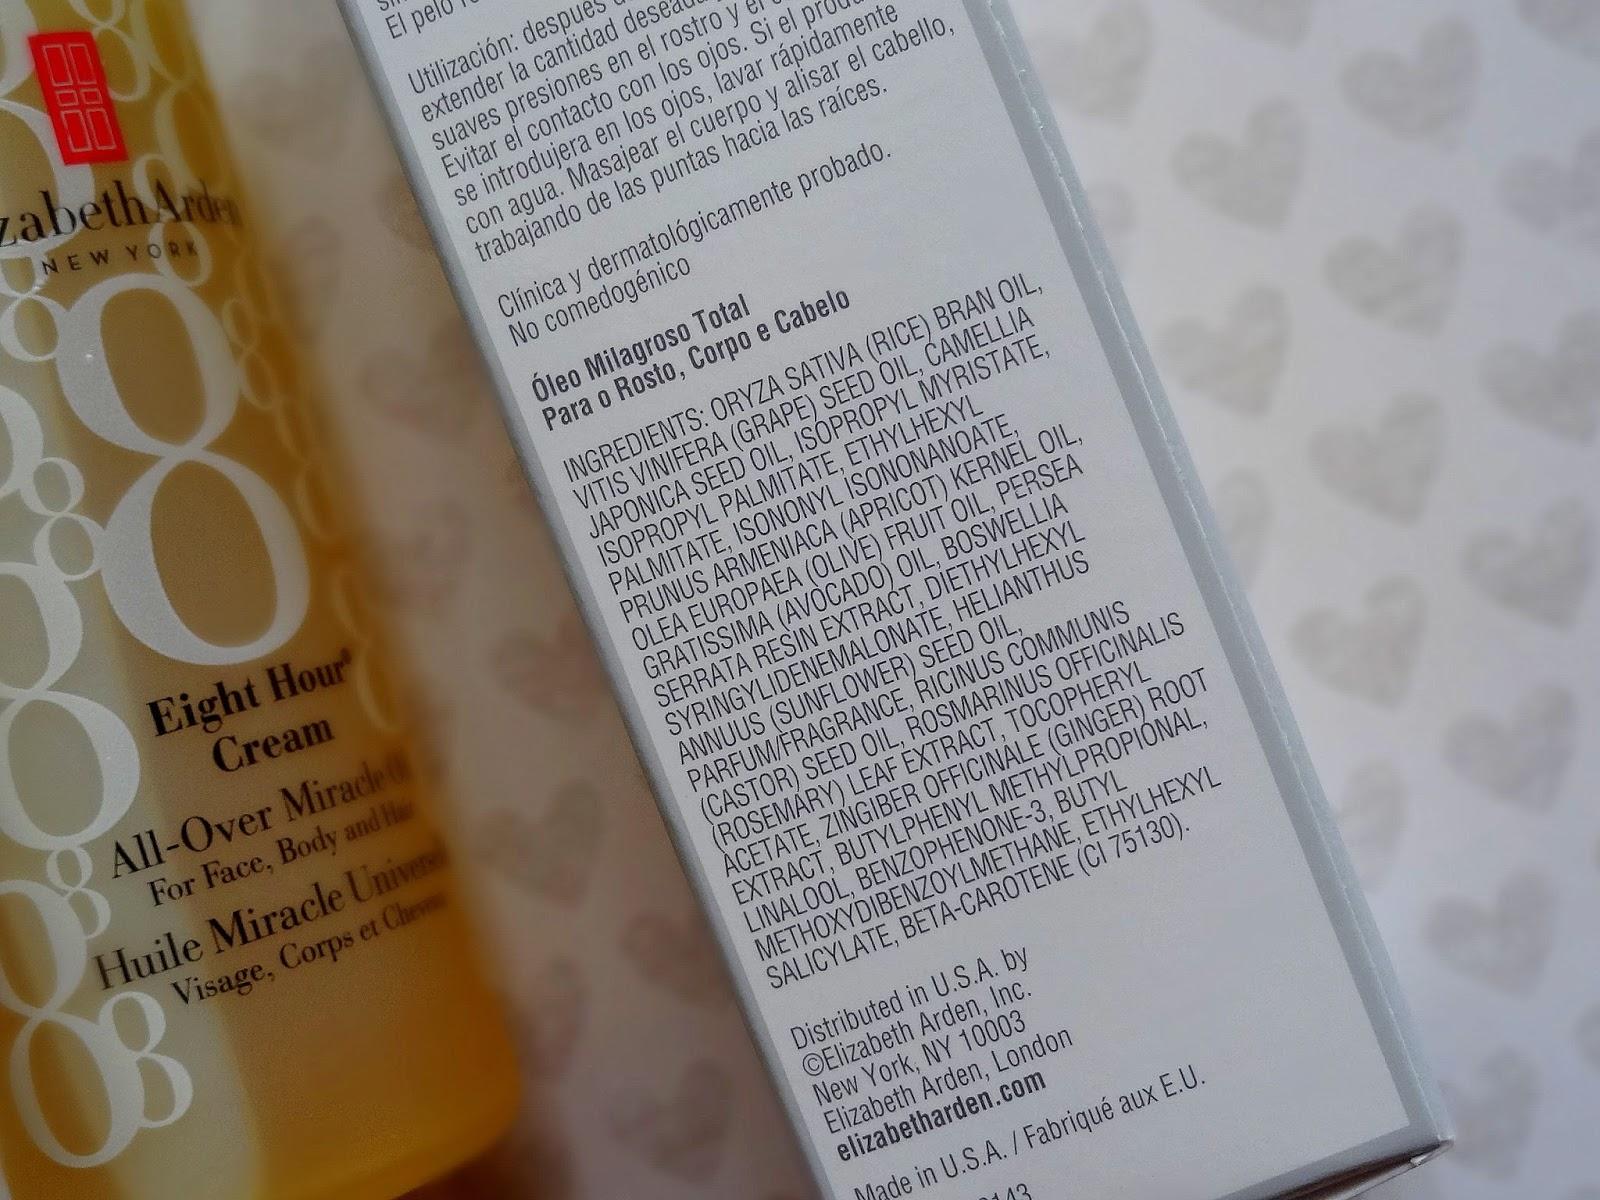 eight hour cream ingredients